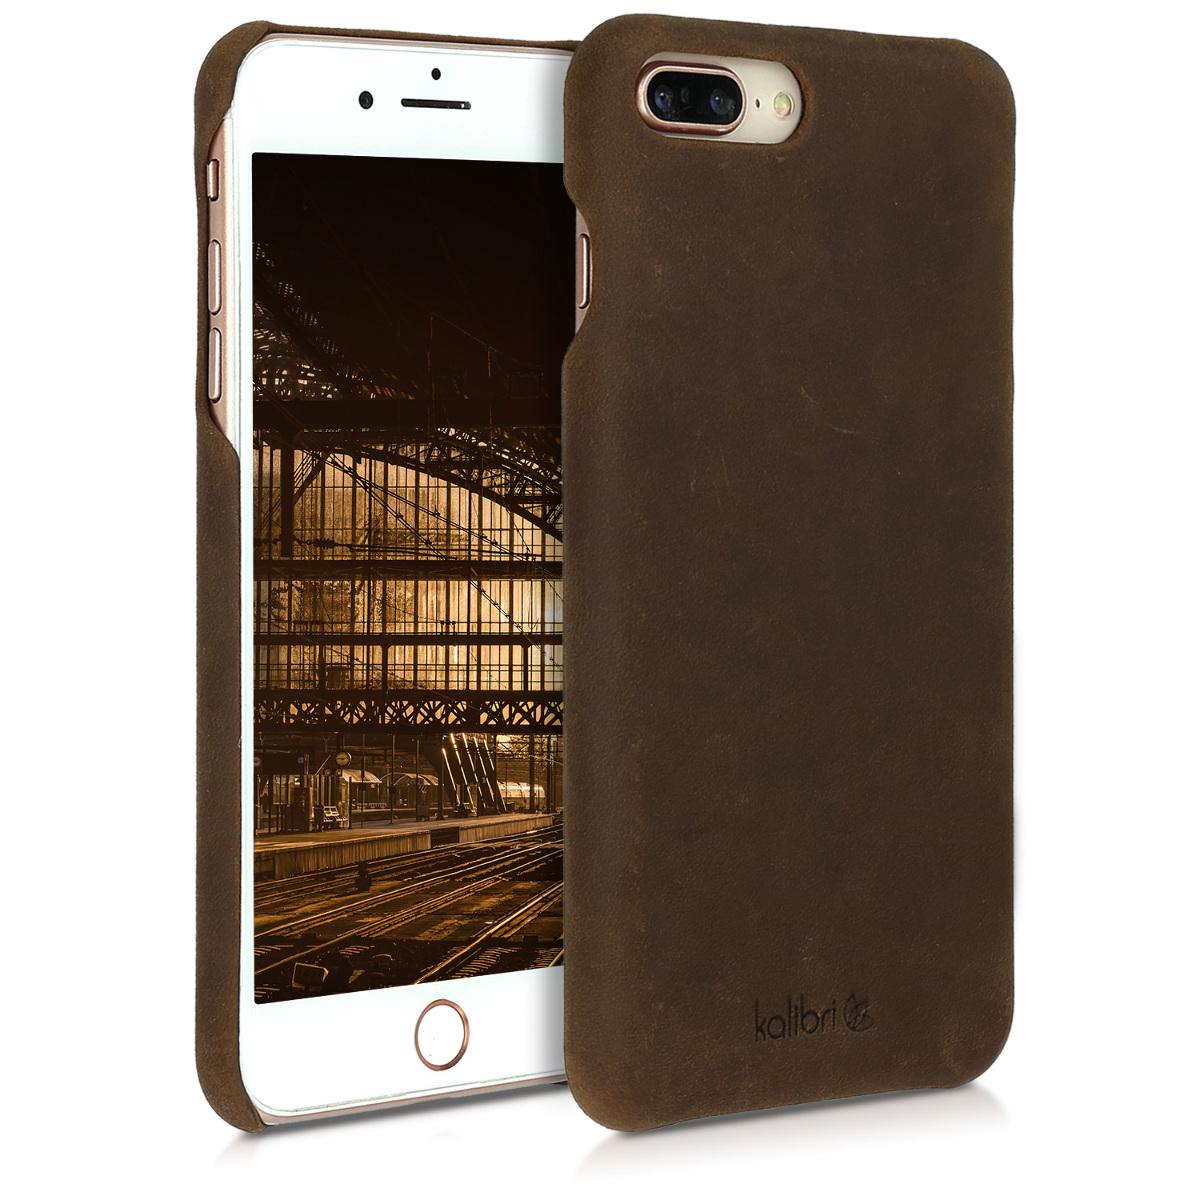 Kalibri Σκληρή Δερμάτινη Θήκη iPhone 8 Plus / 7 Plus - Καφέ (45095.05)